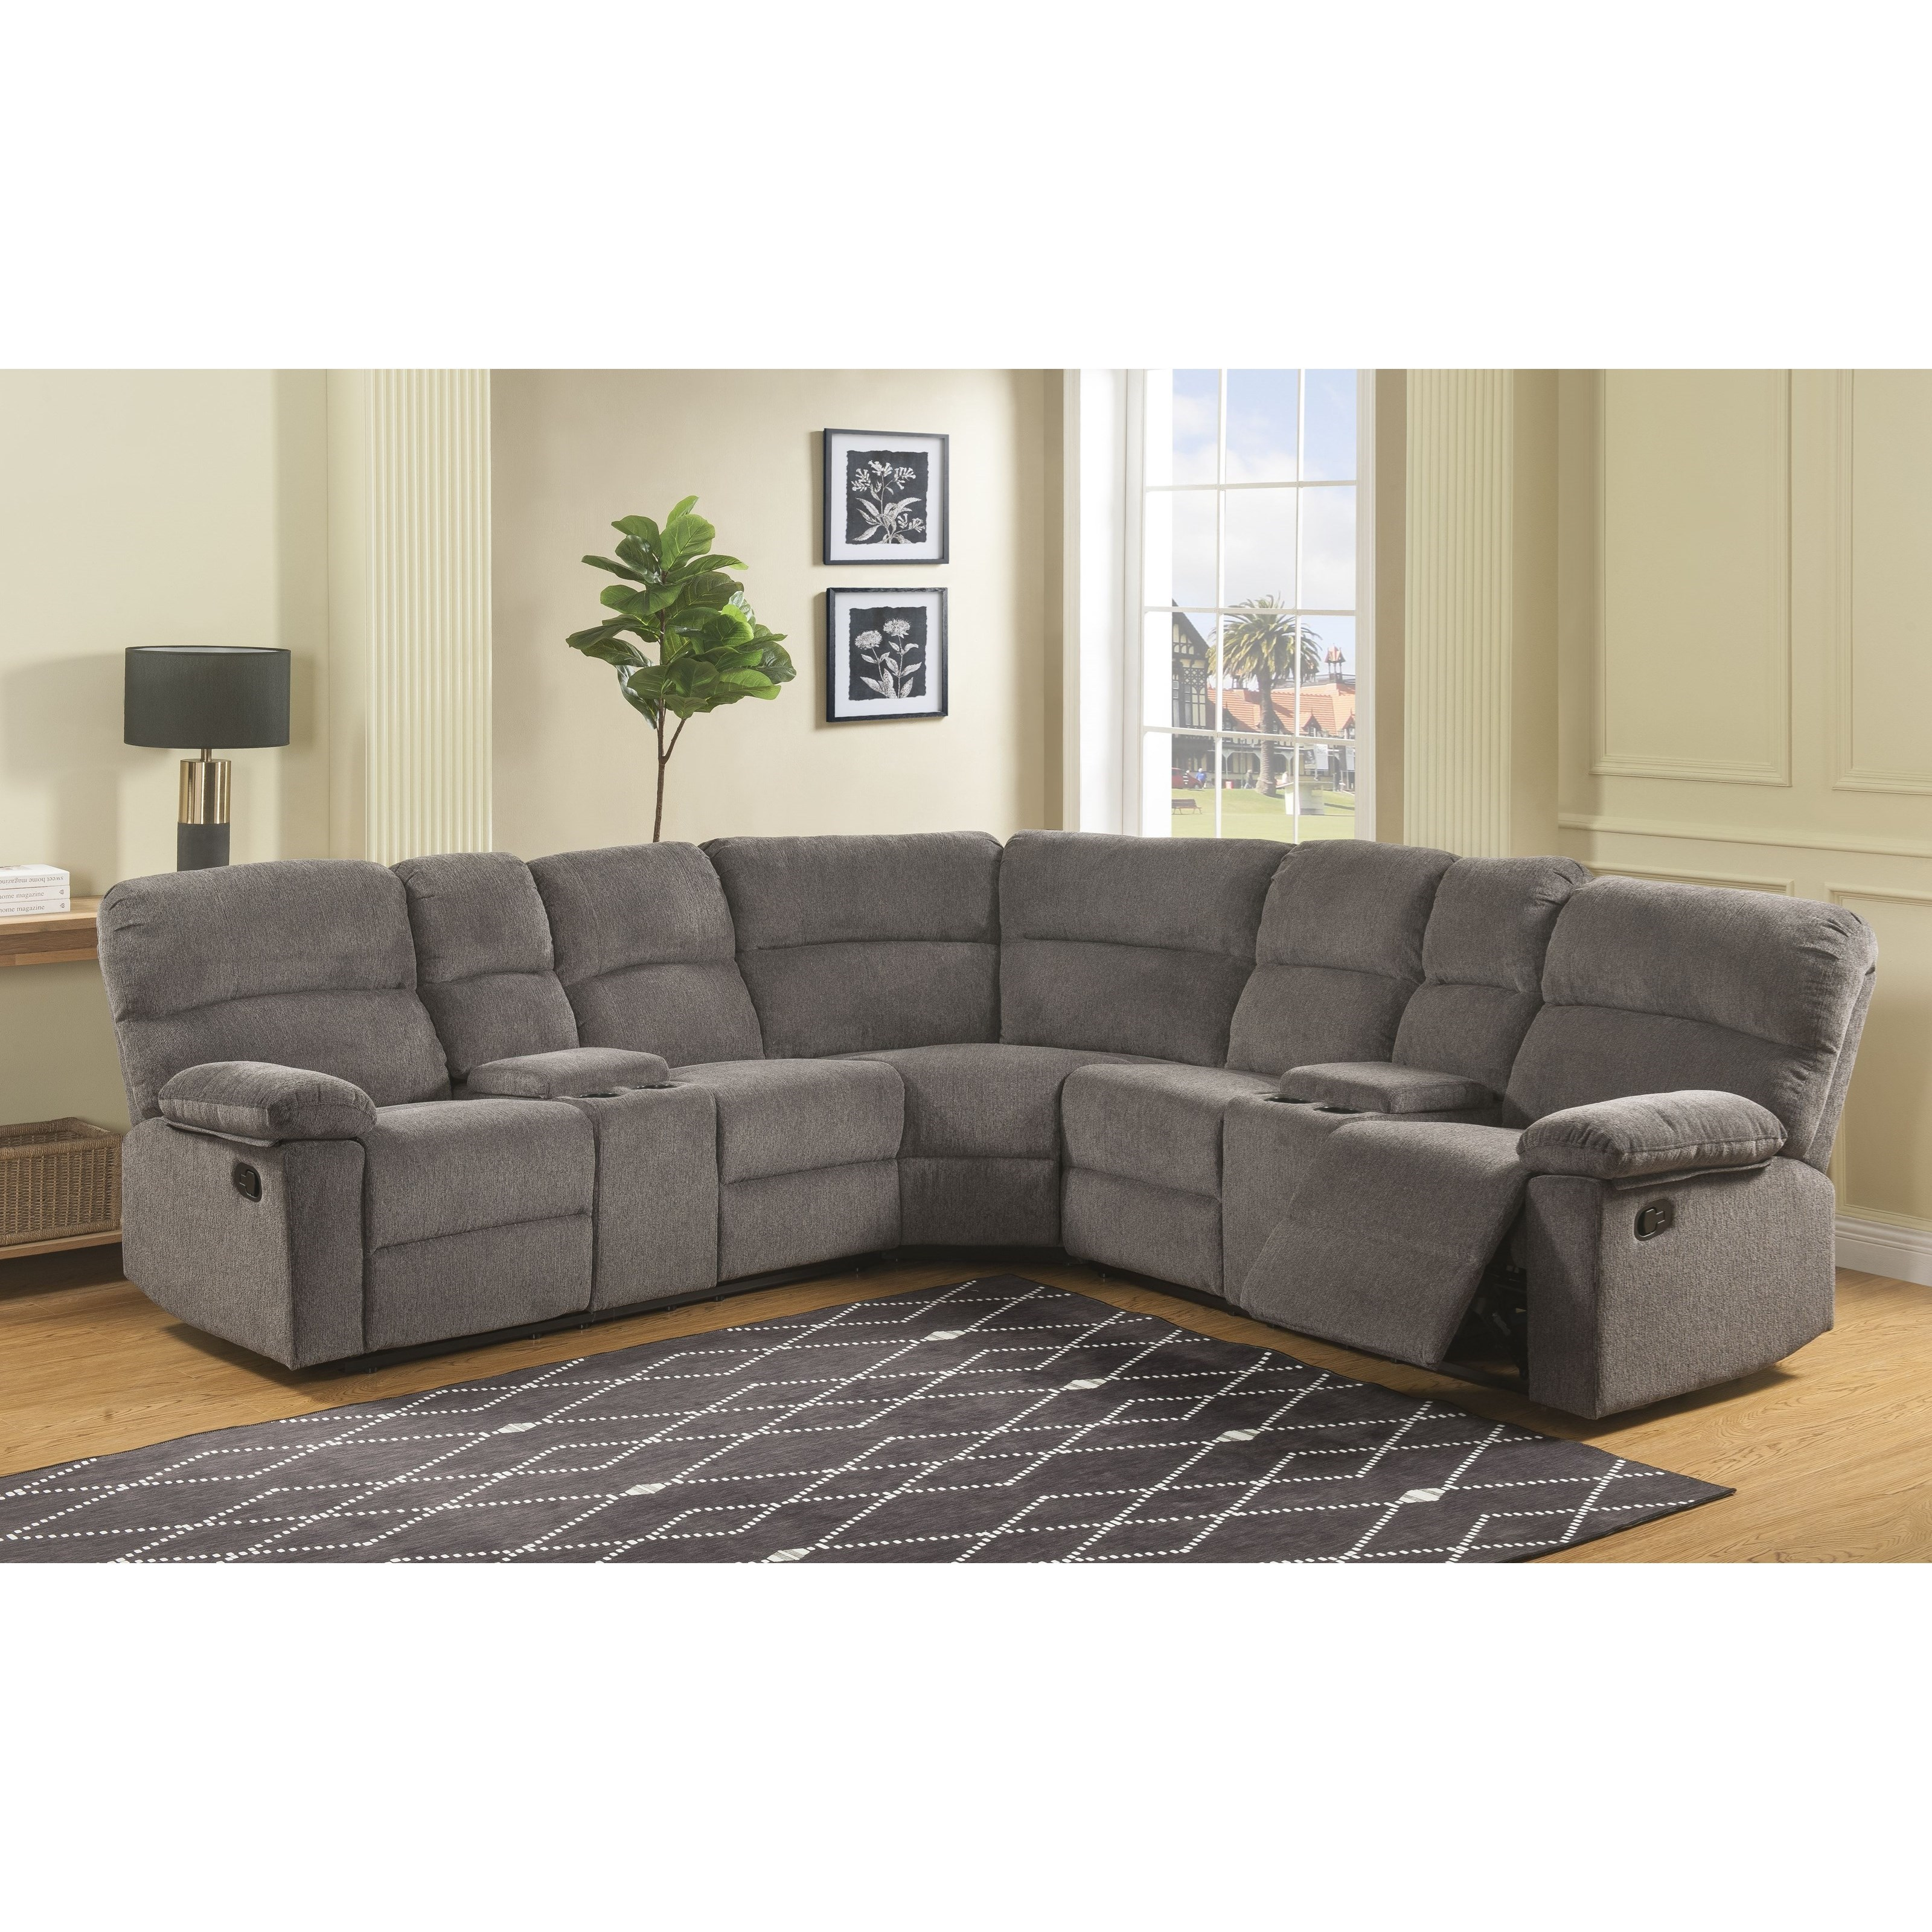 conan 4 seat reclining sectional sofa